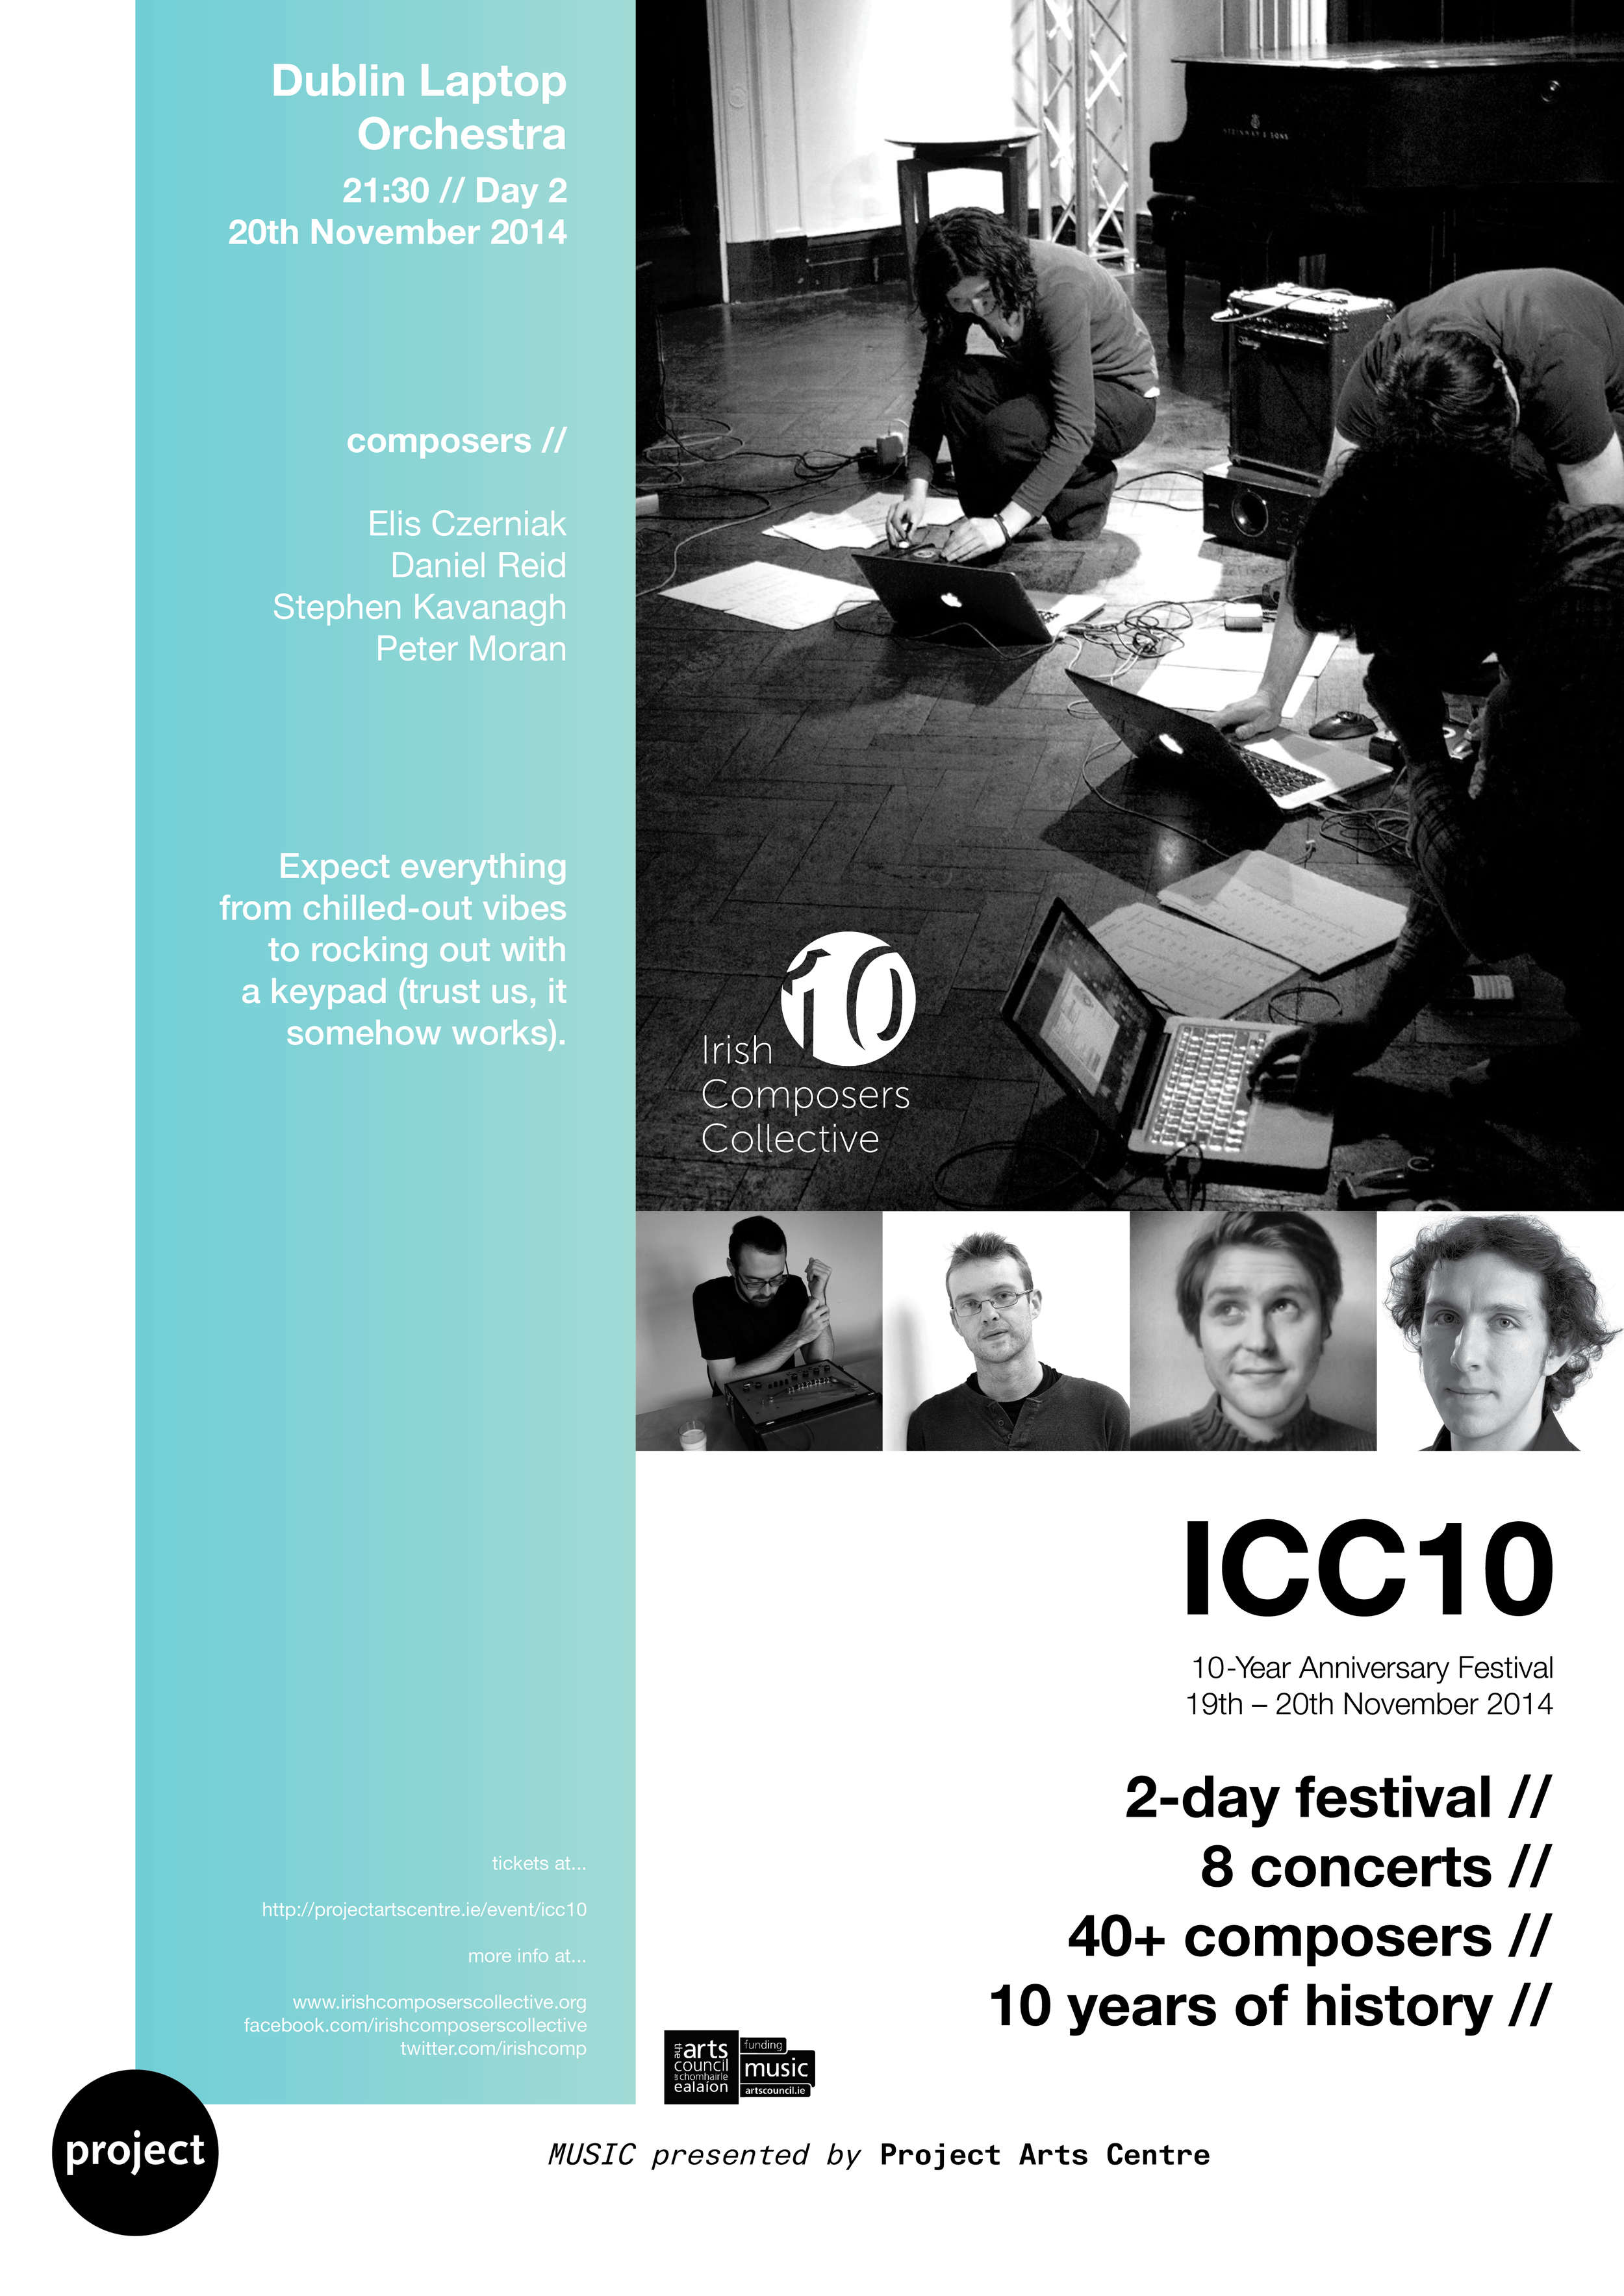 ICC10 A3 poster_Dublin Laptop.png